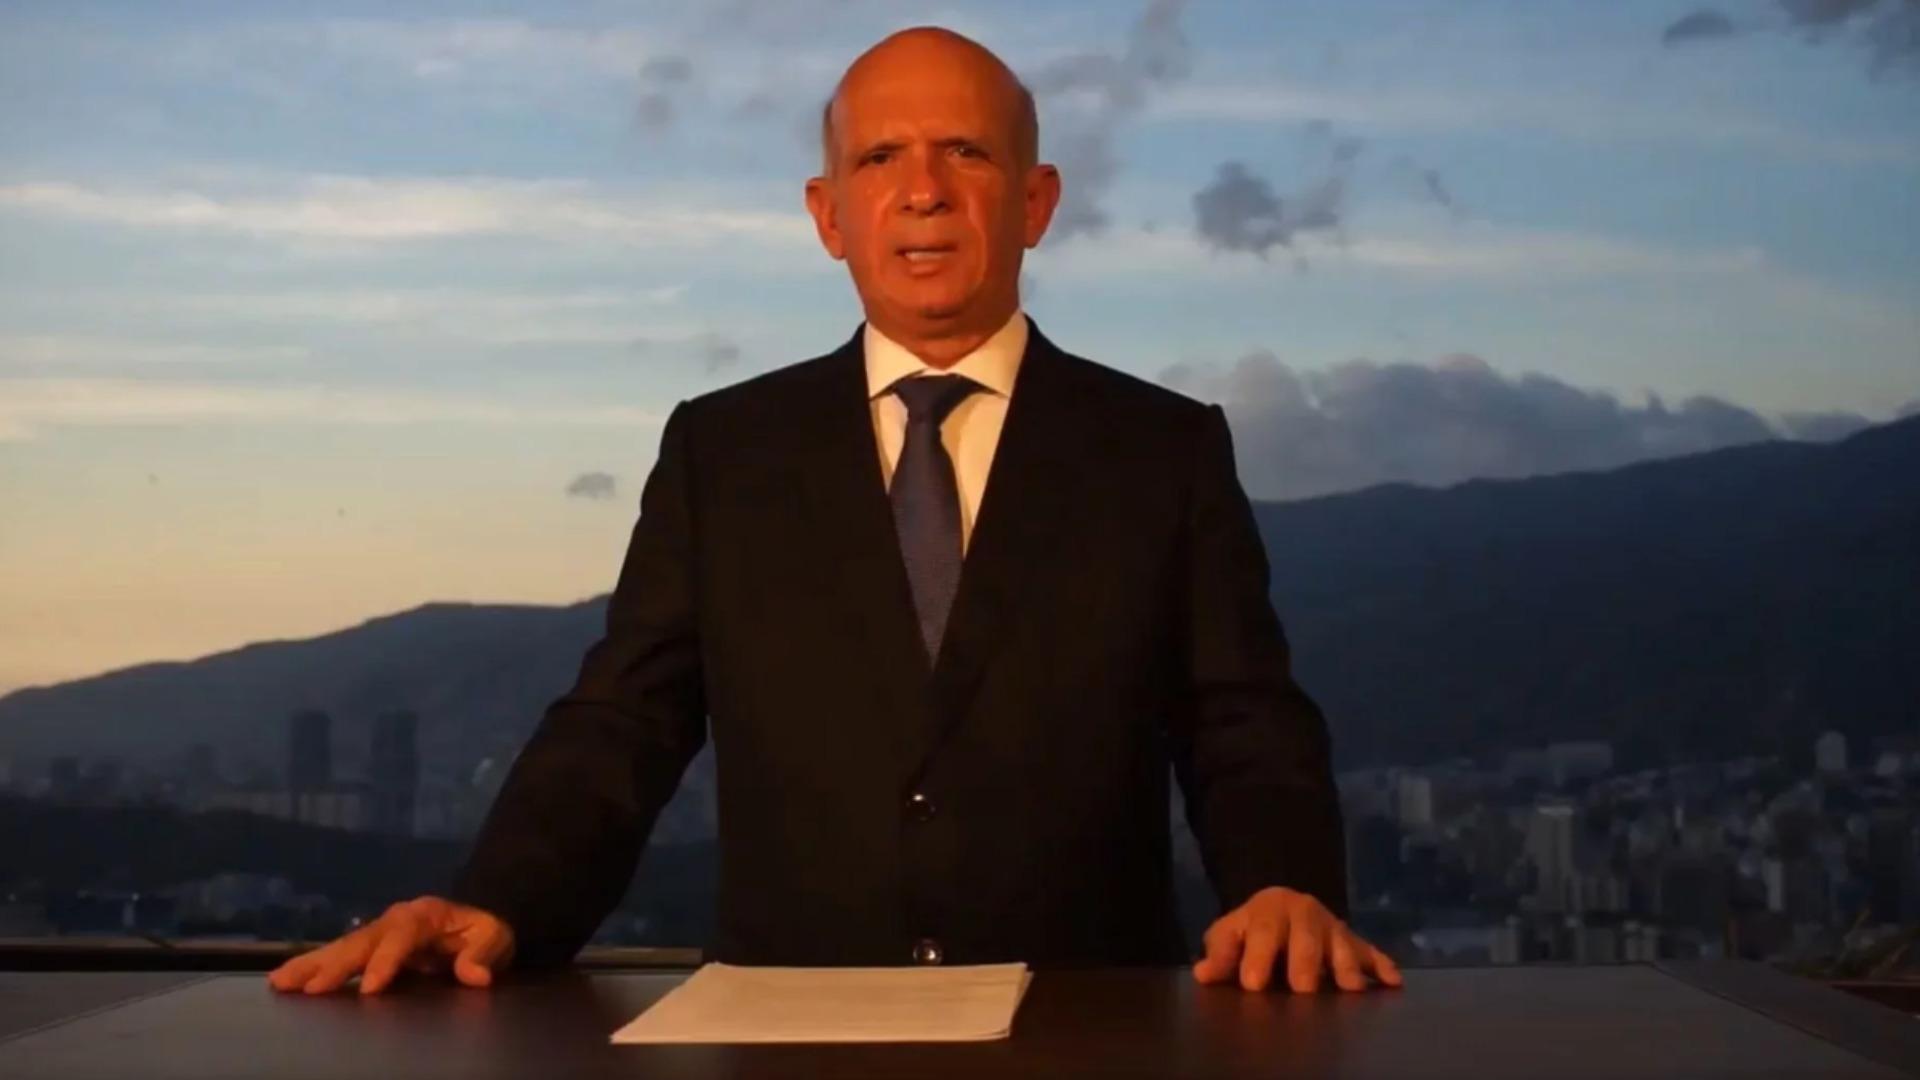 Policía española confirma que no ha podido localizar a Hugo Carvajal